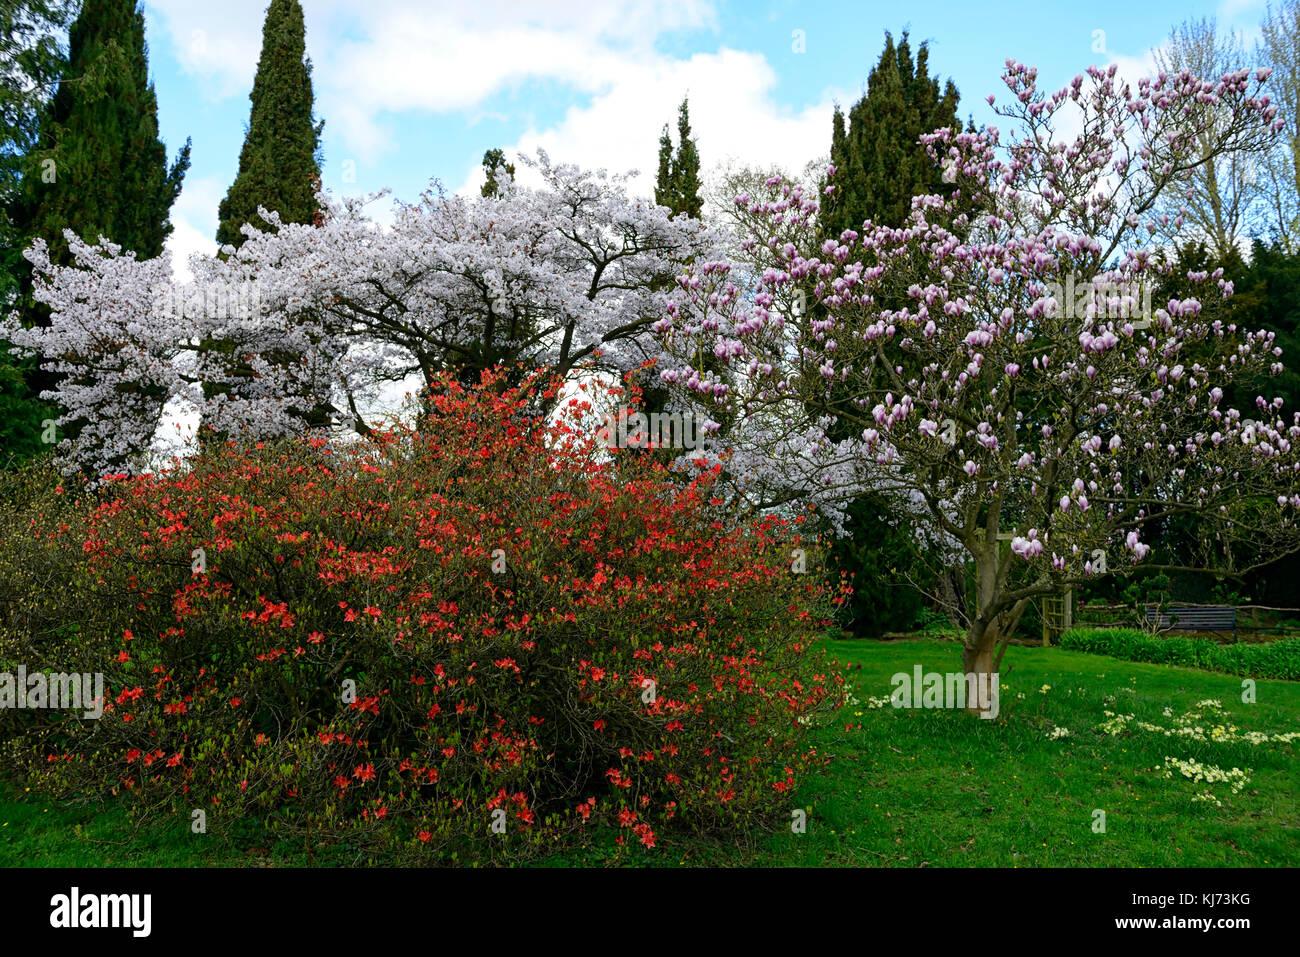 prunus magnolia azalea flores flores flores rojo